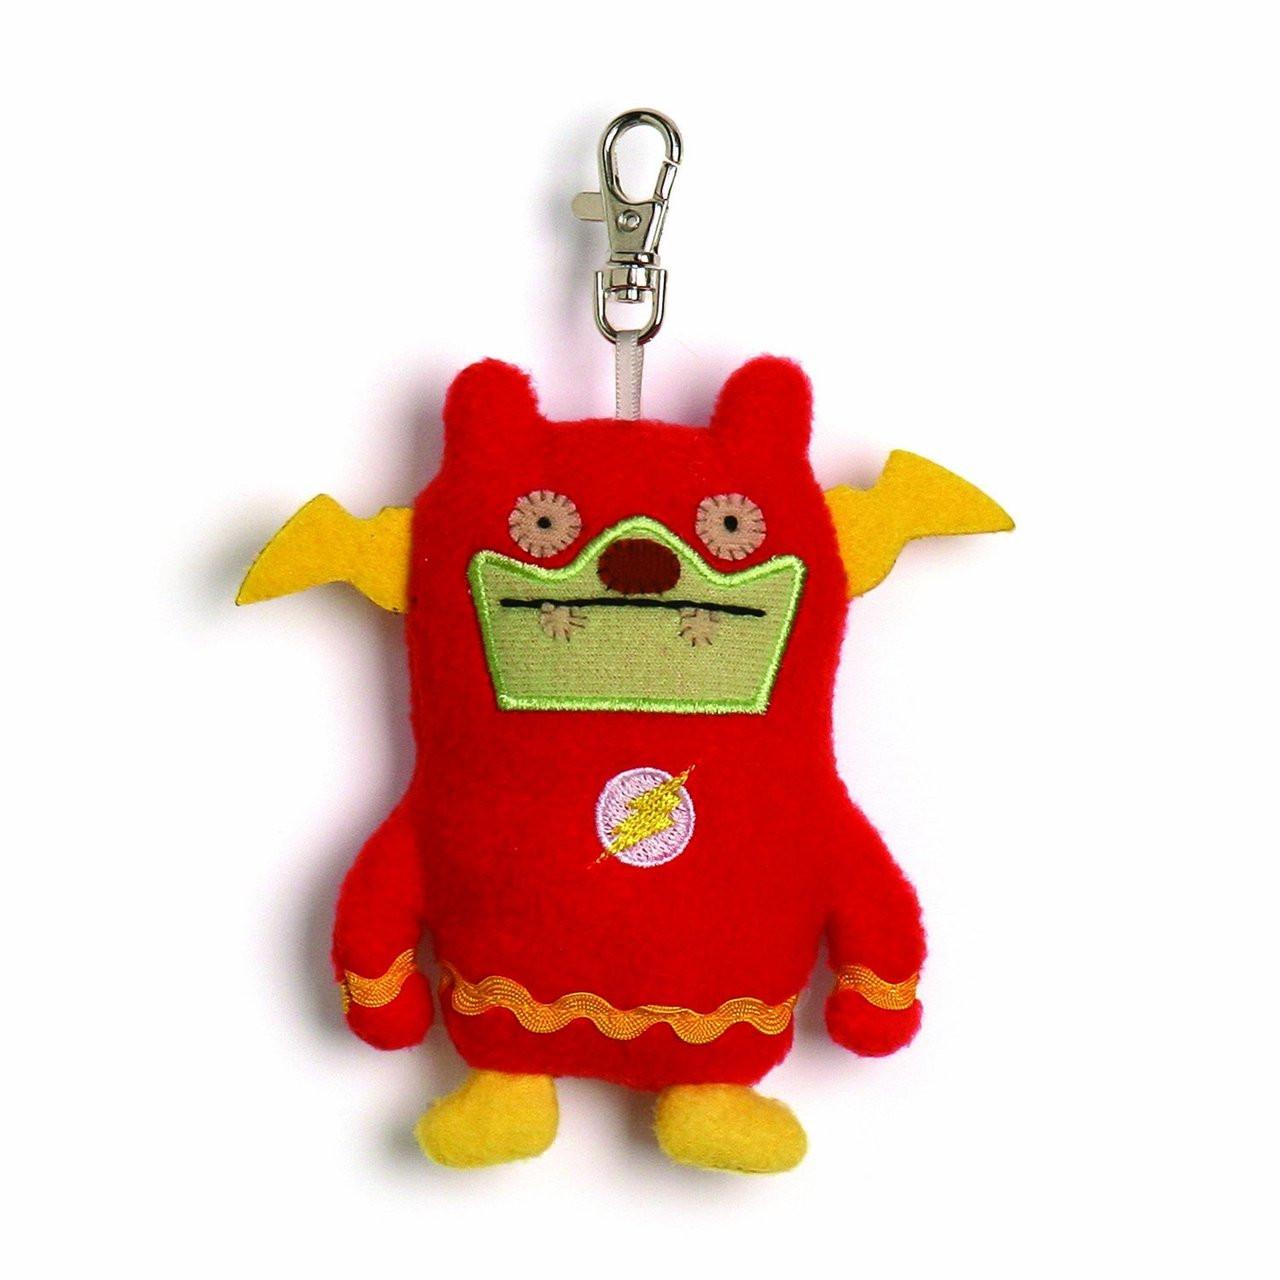 http://store-svx5q.mybigcommerce.com/product_images/web/028399066629.jpg